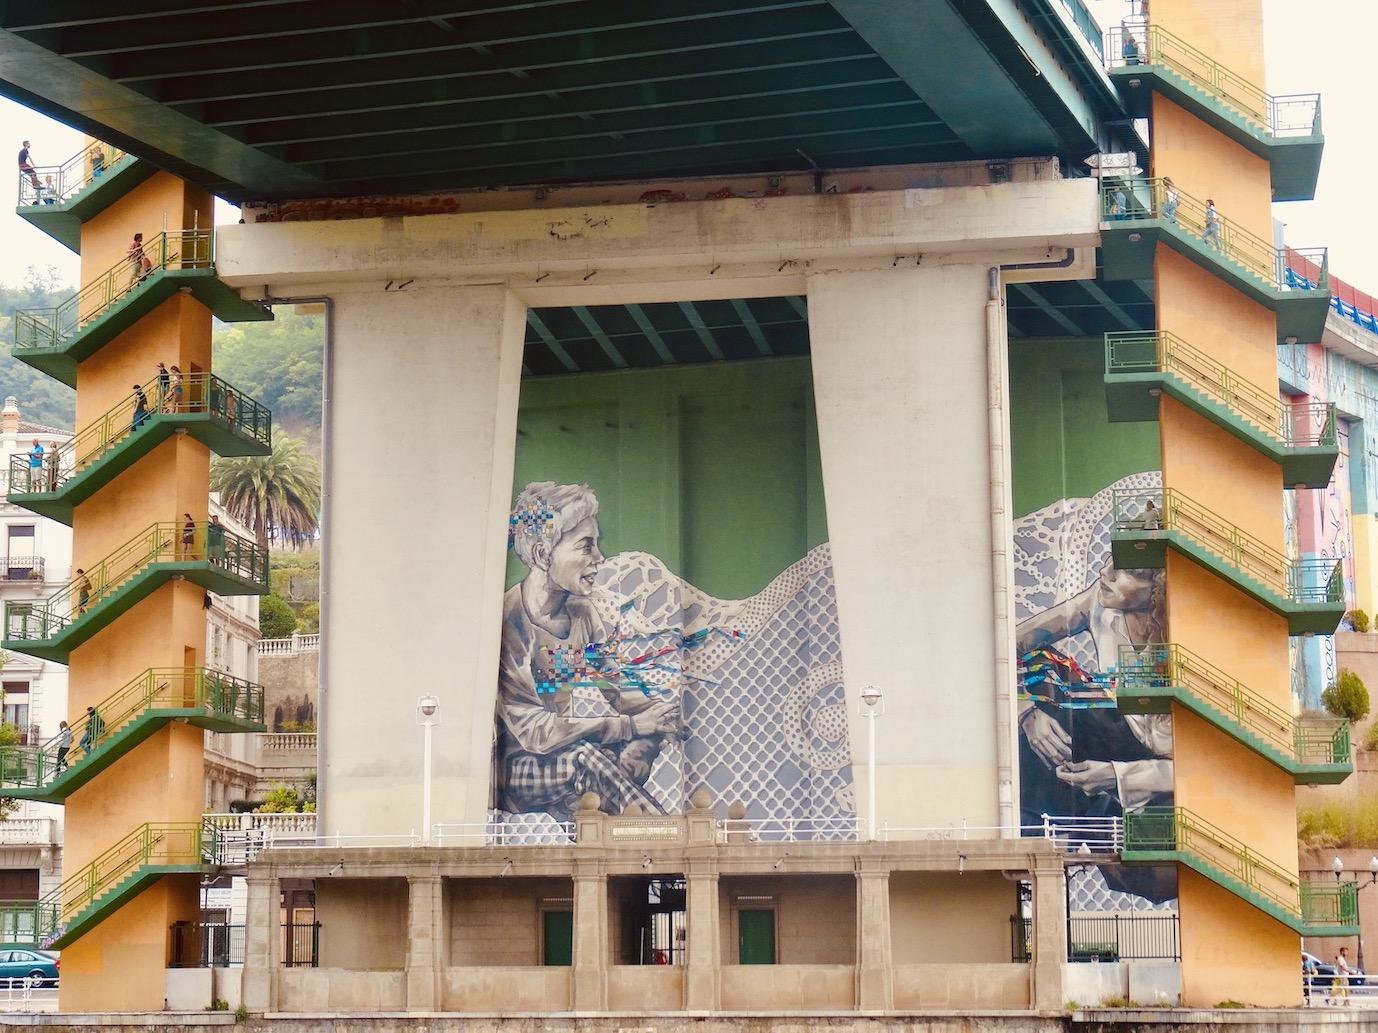 Street art Bilbao Spain.